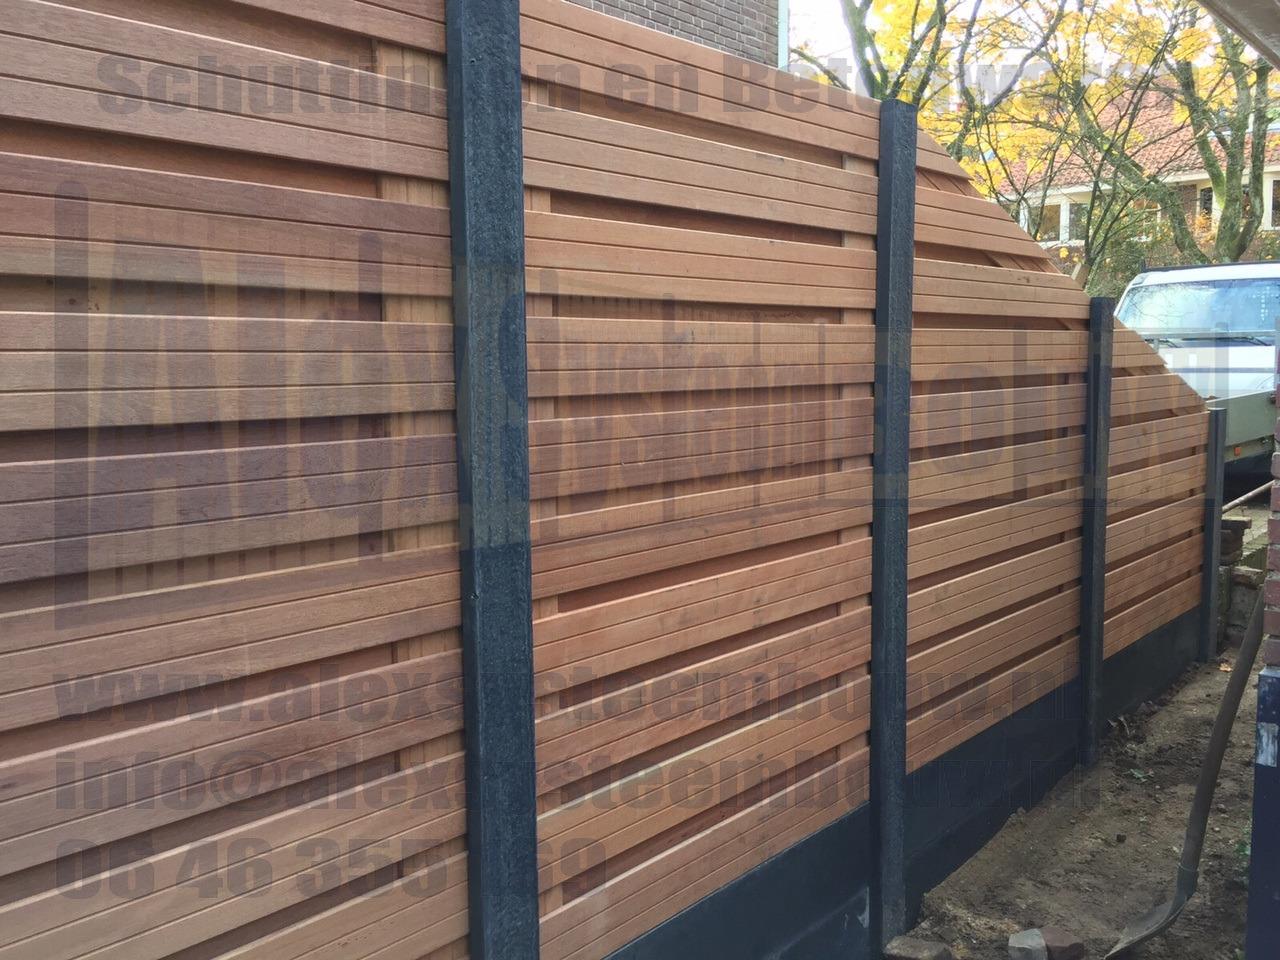 Schutting-hardhout-duurzaam-21-planks-hout-beton-horizontaal